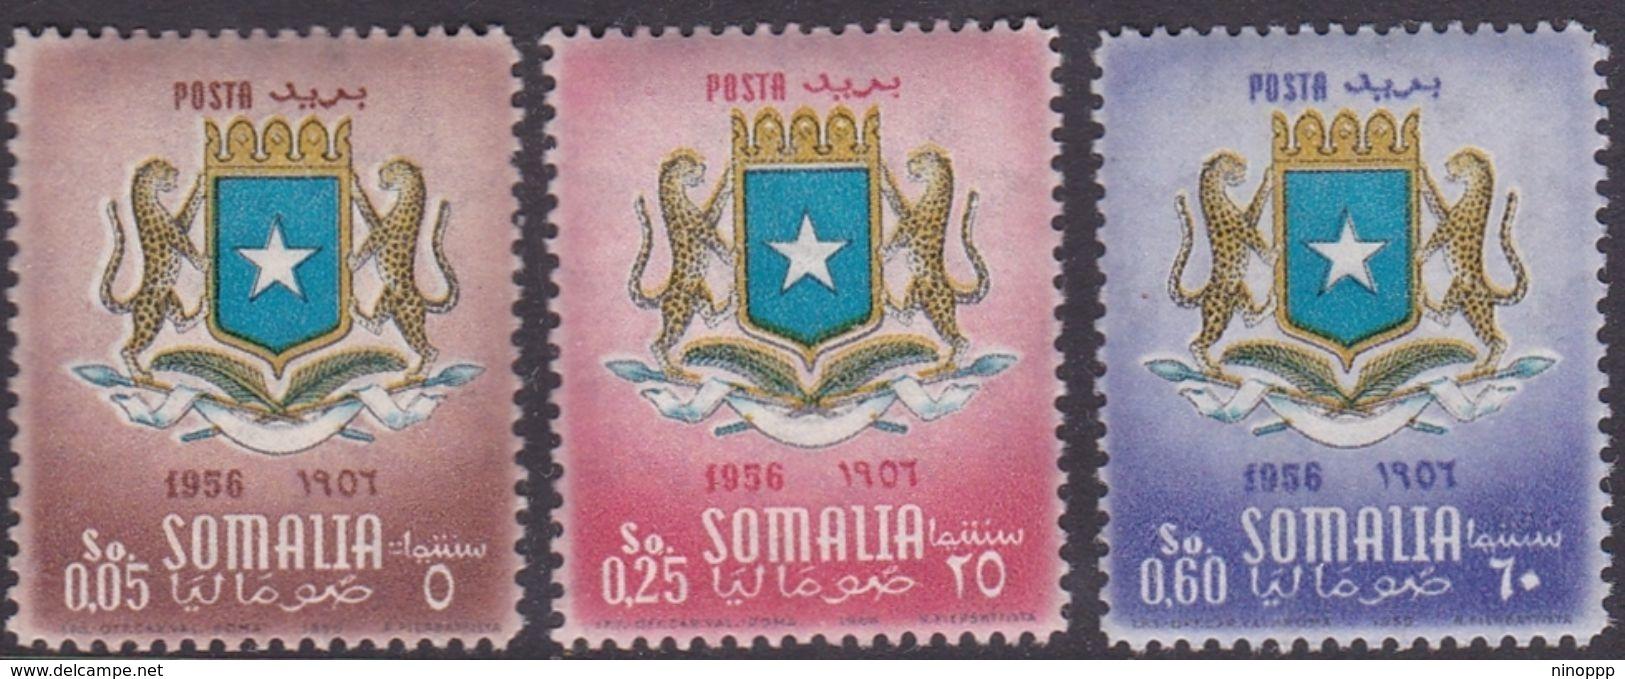 Somalia Scott 210-212 1957 Coat Of Arms, Mint Never Hinged - Somalie (AFIS)